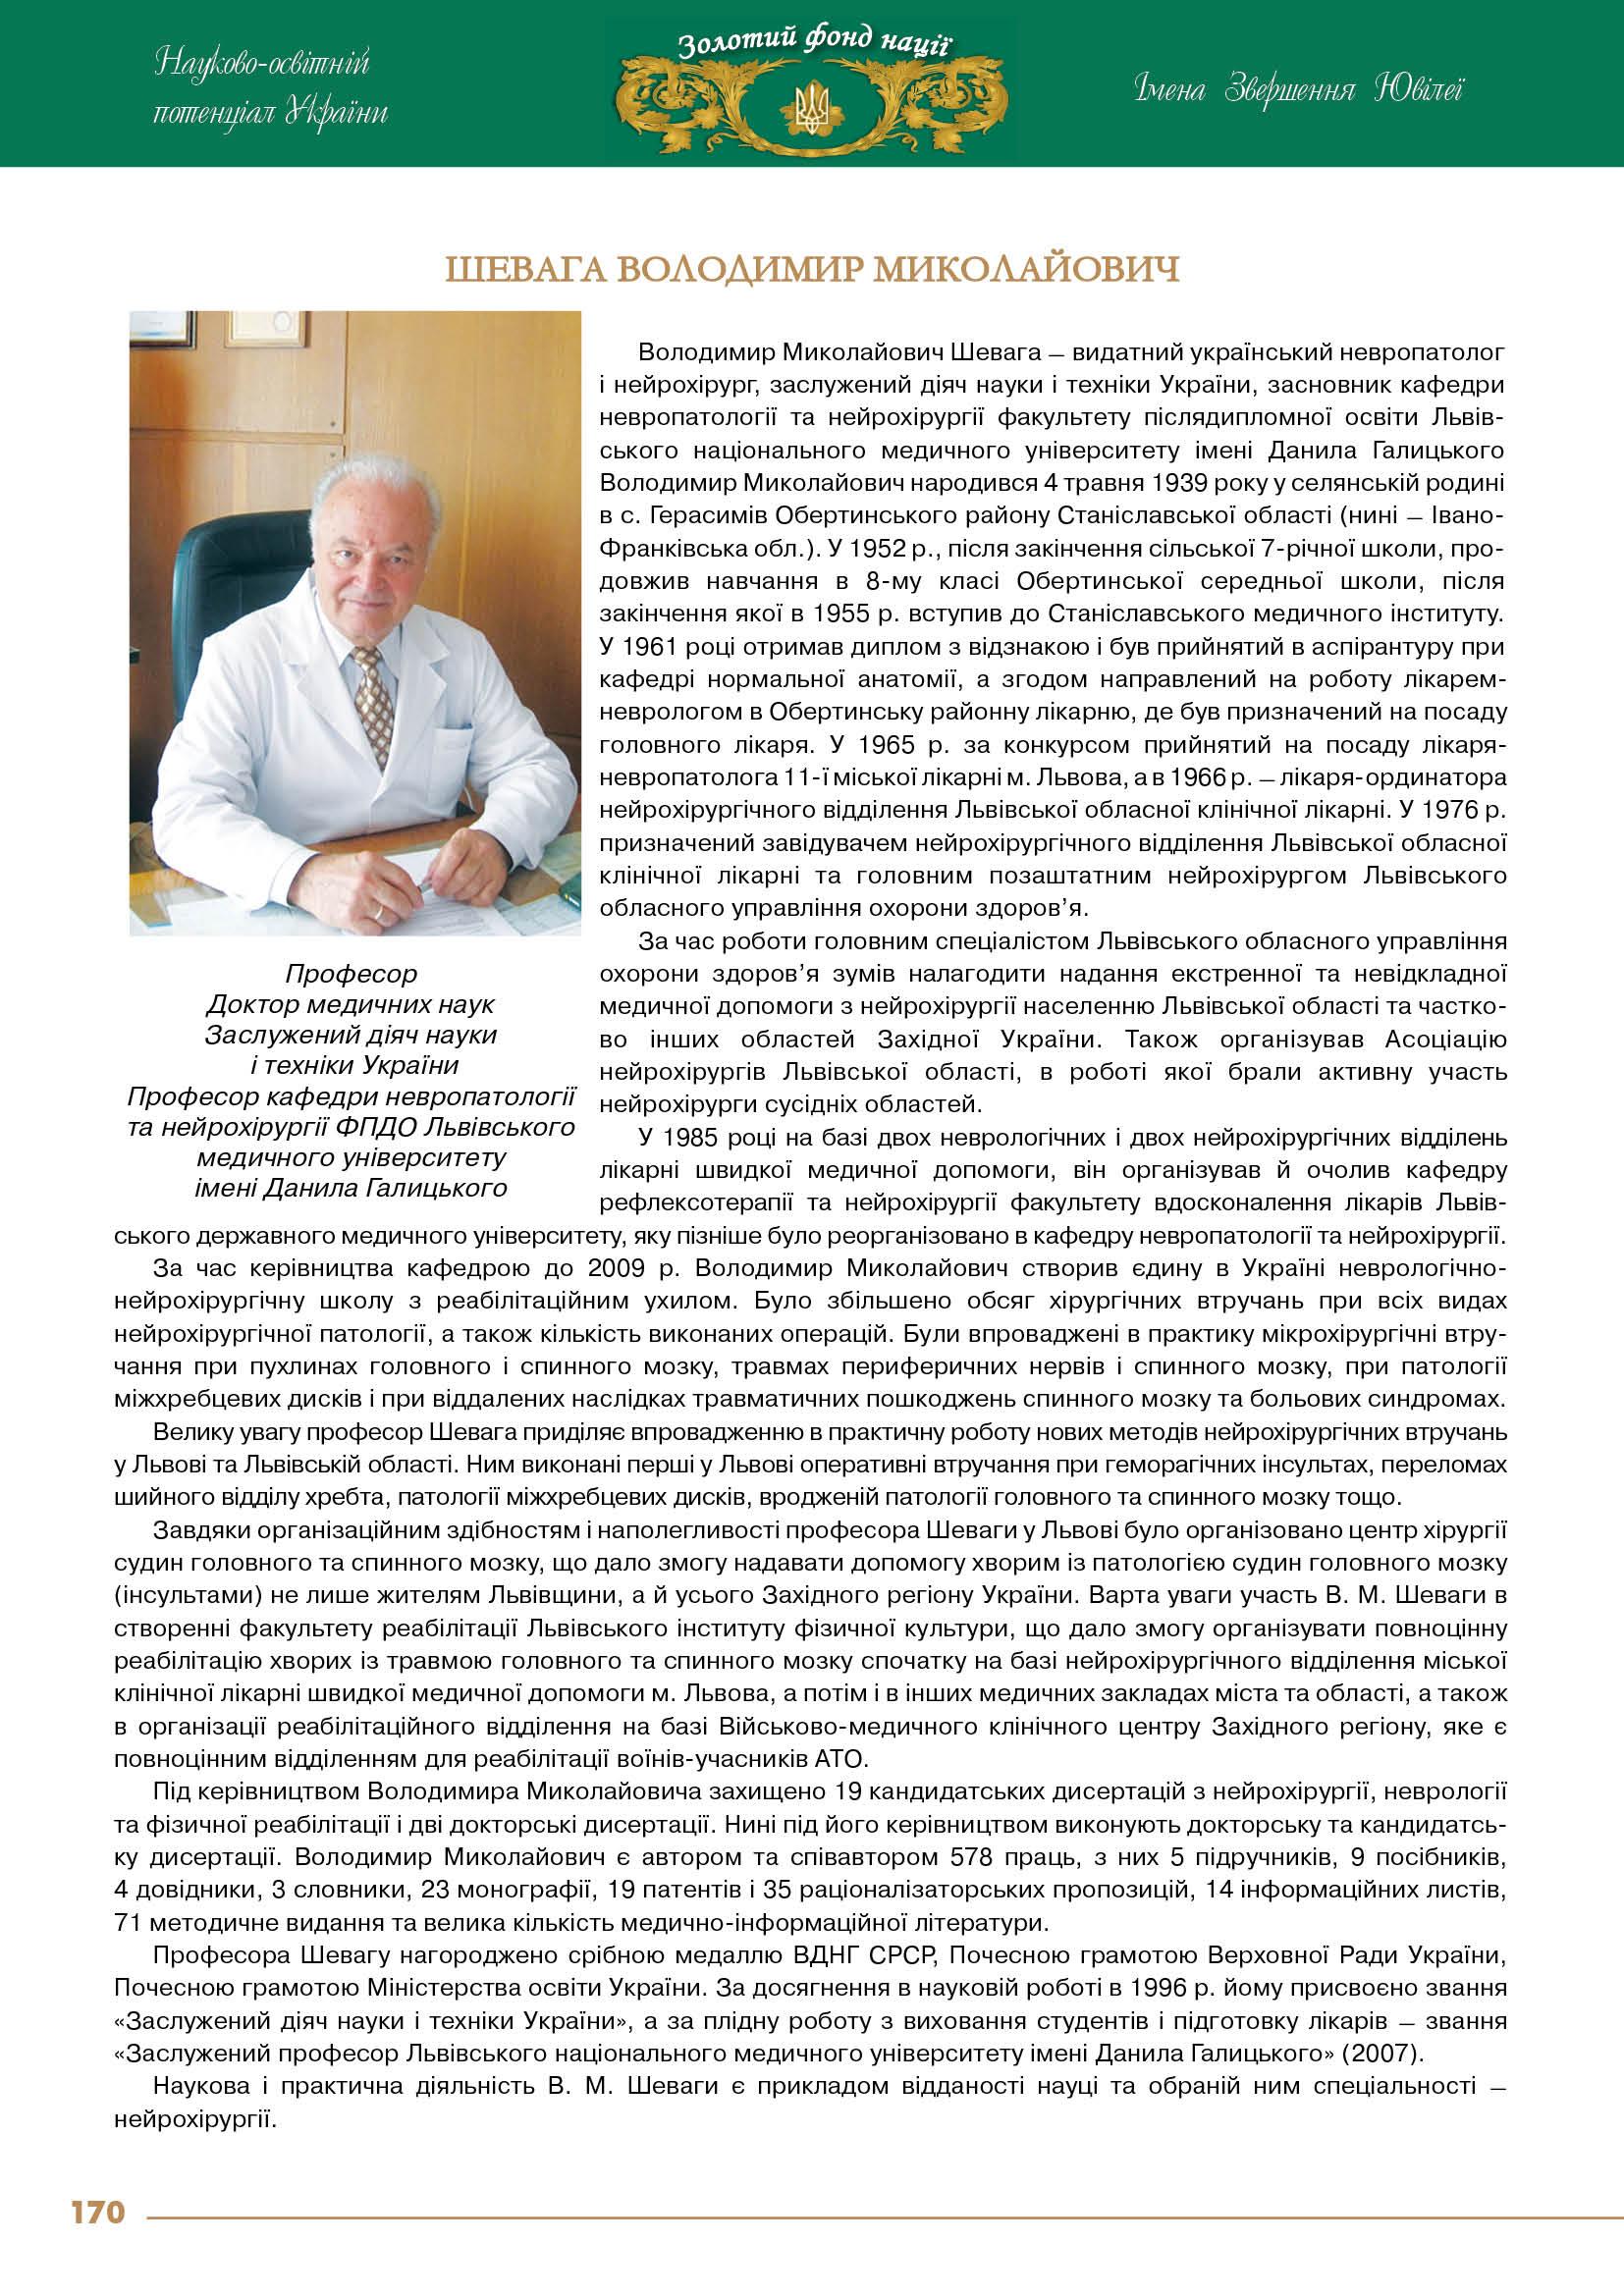 Шевага Володимир Миколайович